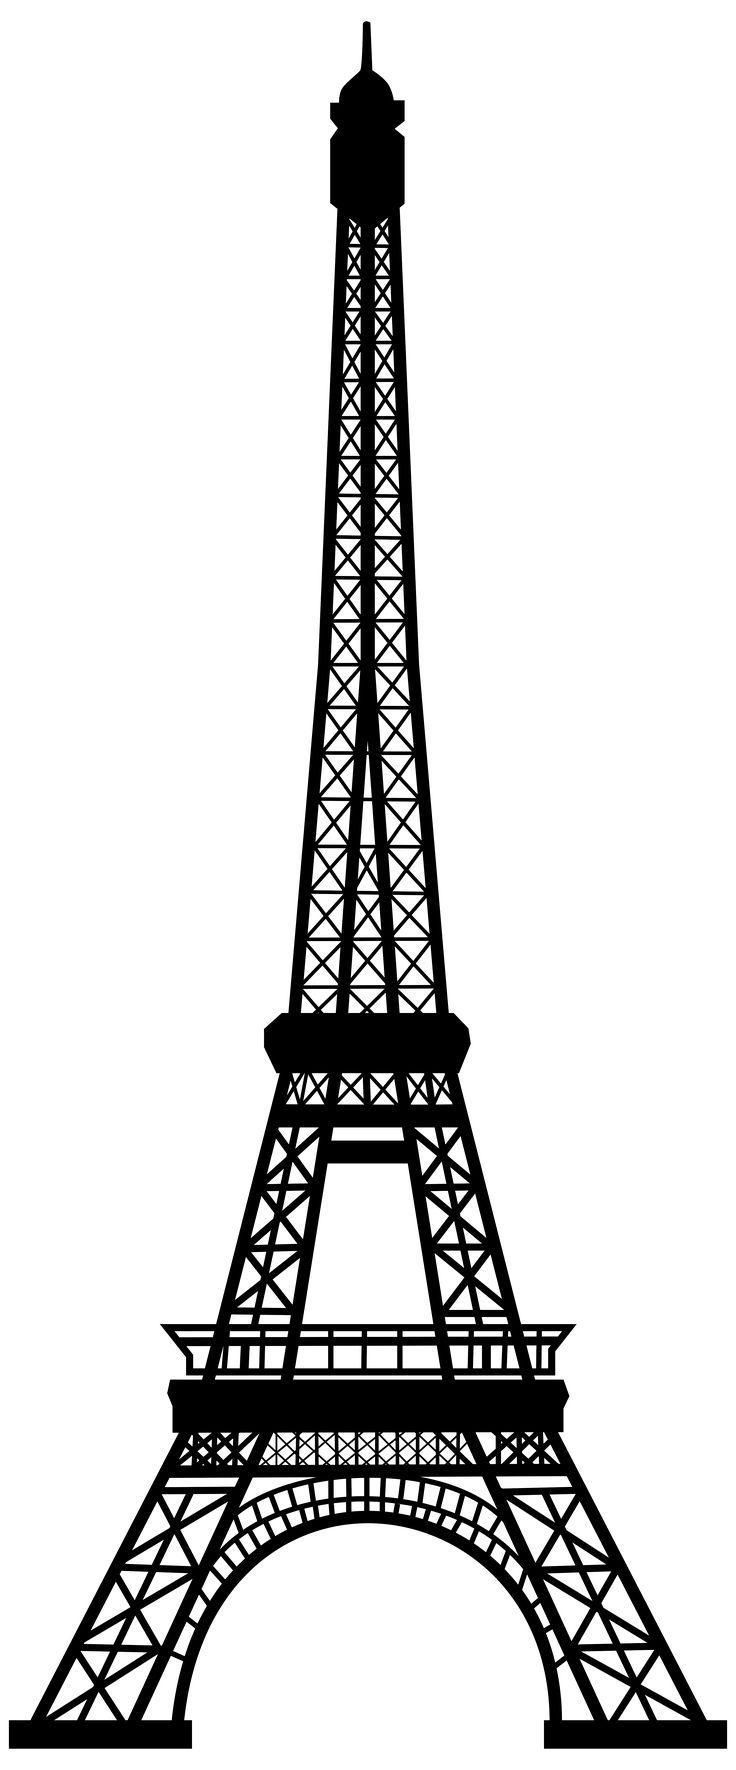 Best 25+ Eiffel Tower Art Ideas On Pinterest | Eiffel Tower Intended For Metal Eiffel Tower Wall Art (View 9 of 20)